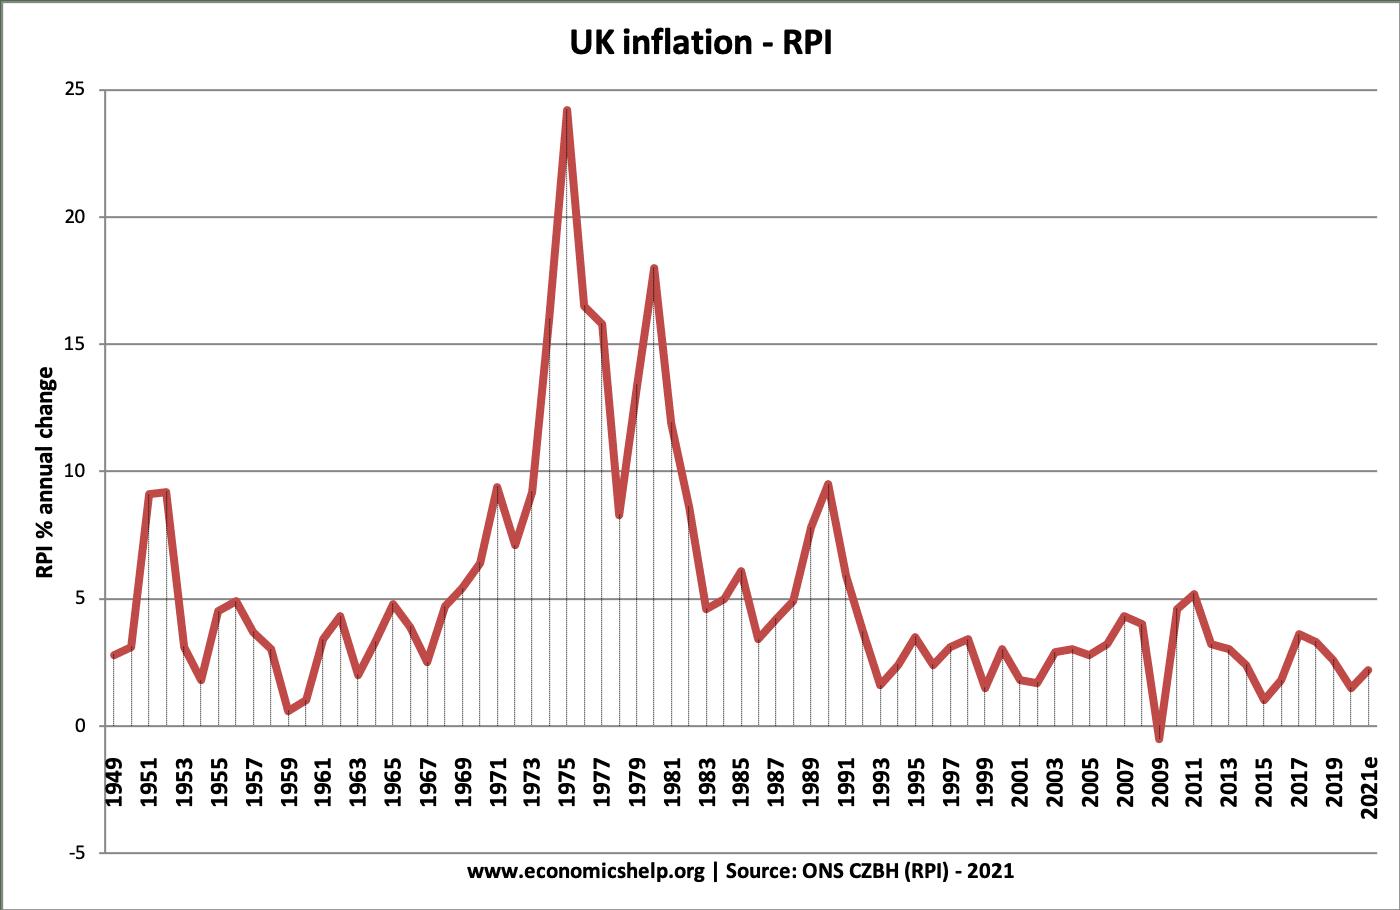 UK-inflation-1949-2021